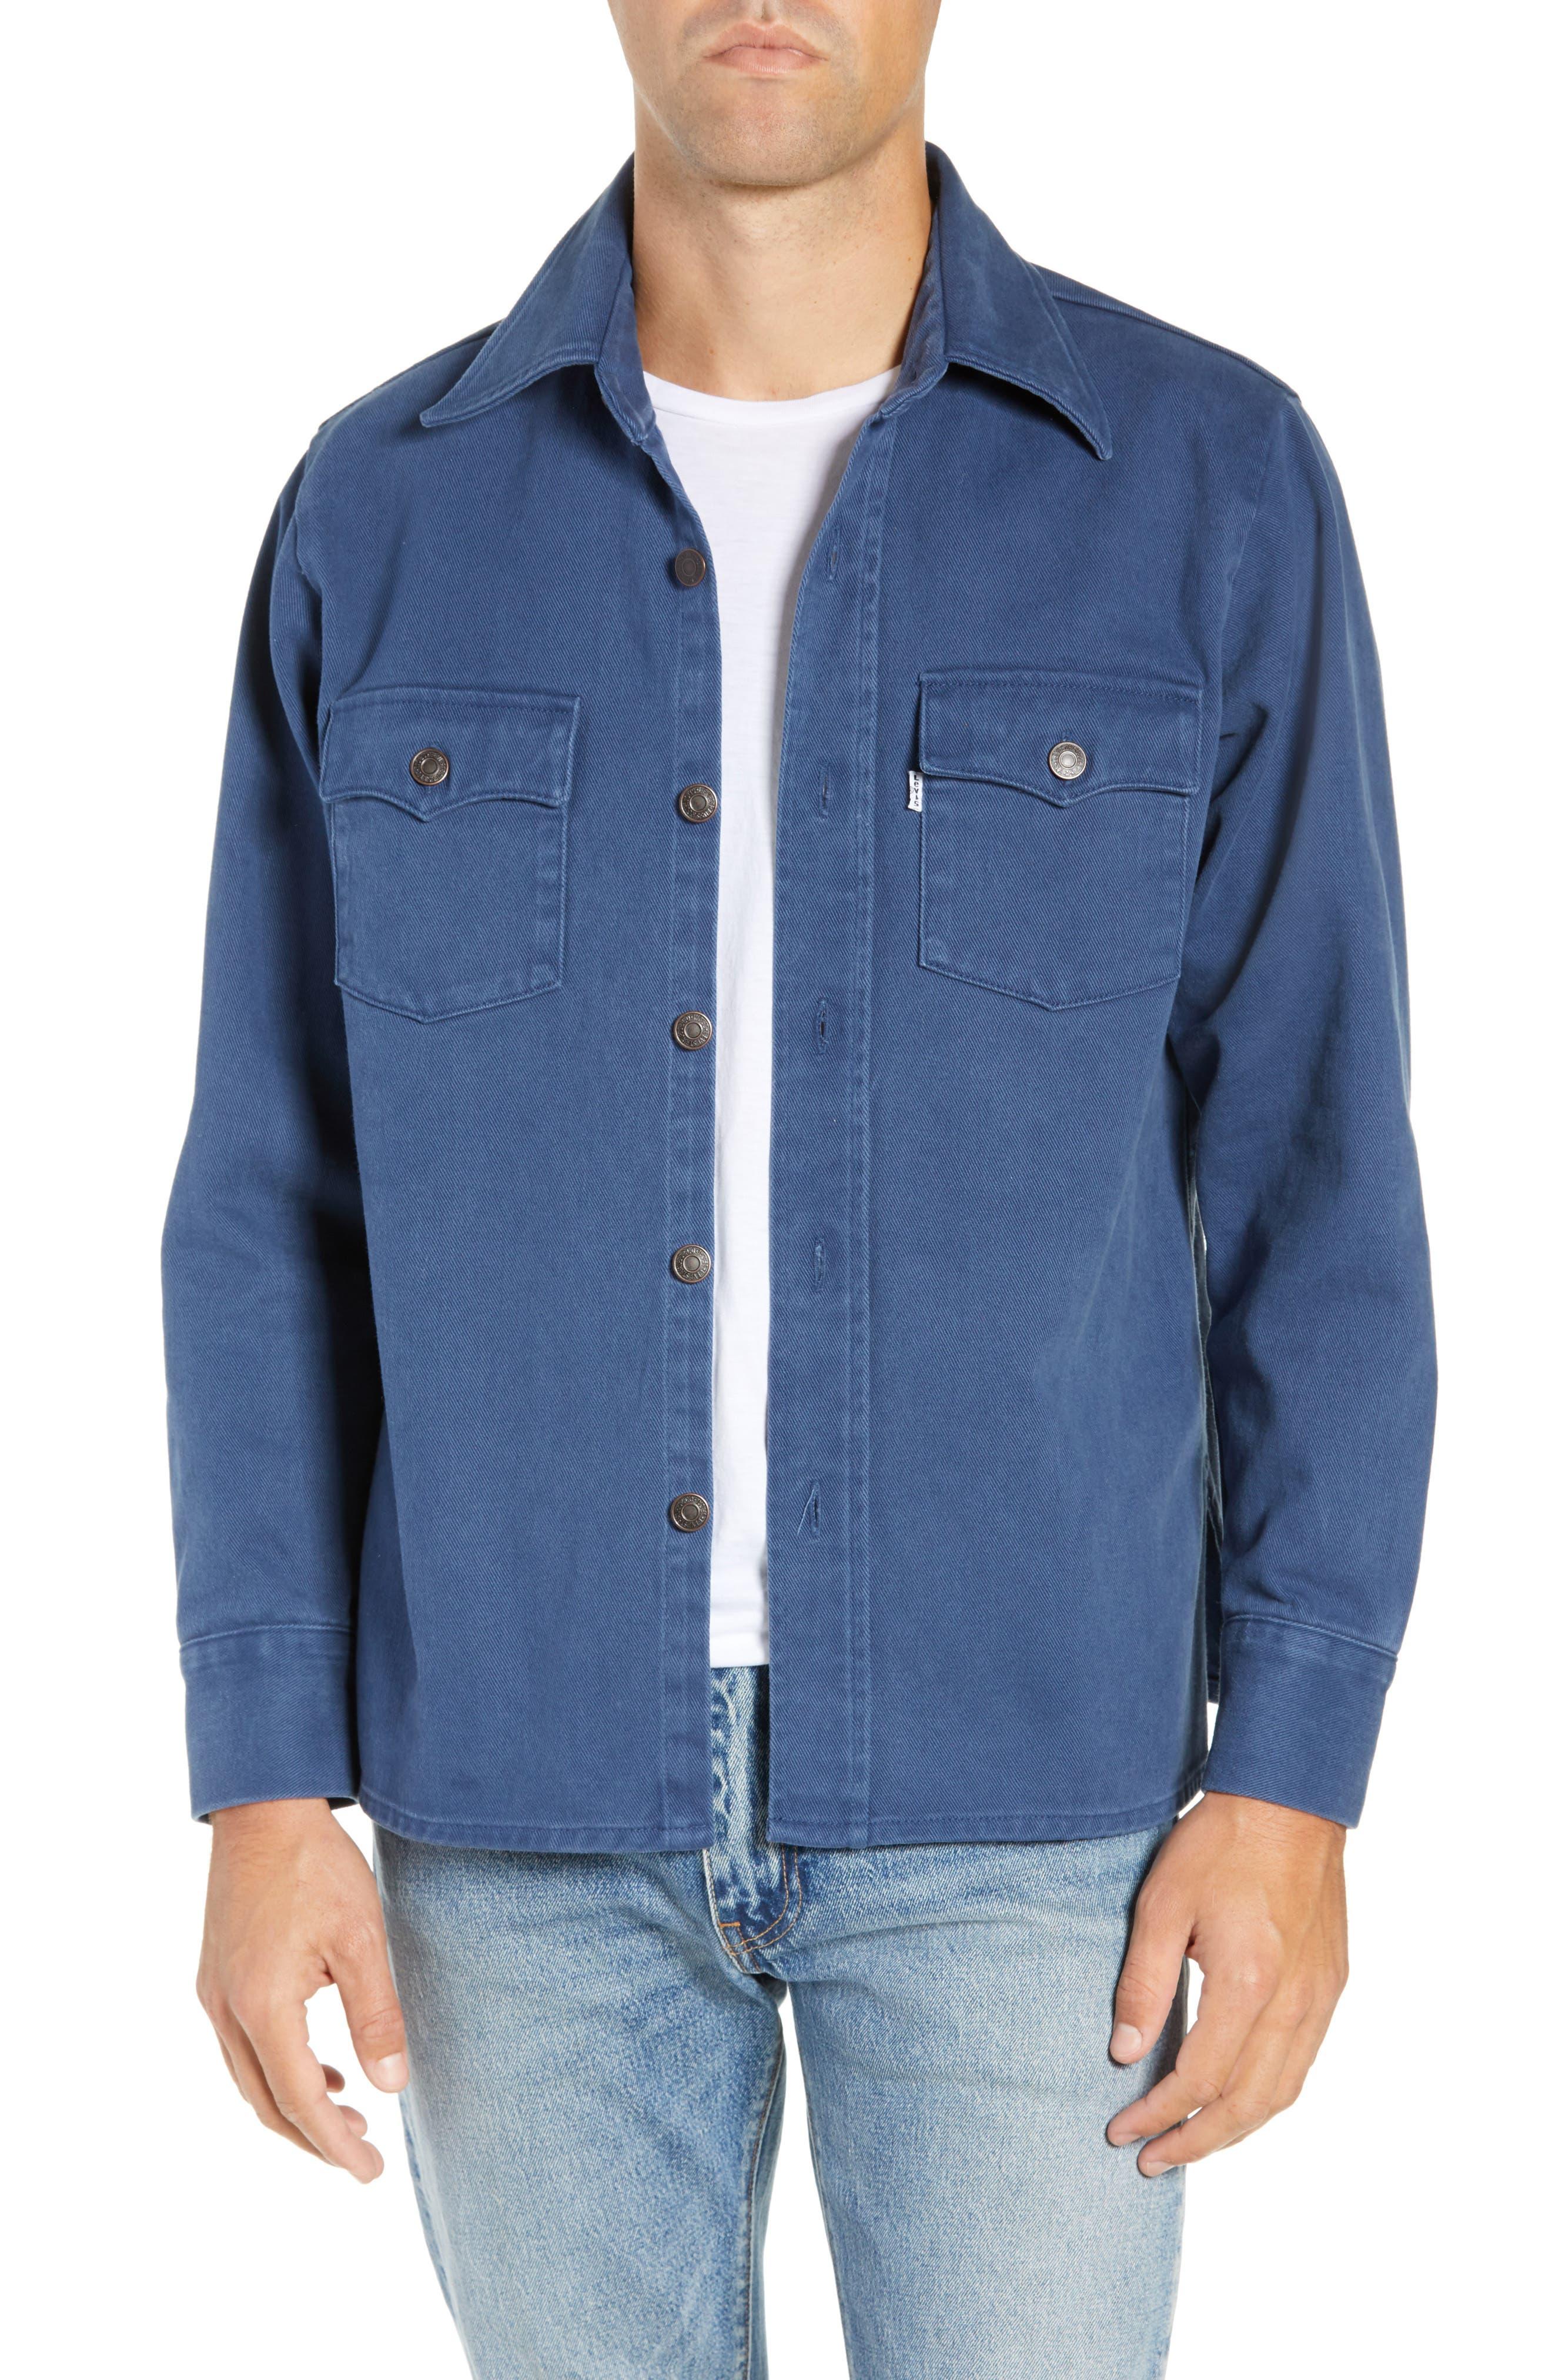 Vintage Shirts – Mens – Retro Shirts Mens Levis Vintage Clothing Classic Fit Shirt Jacket Size X-Large - Blue $116.98 AT vintagedancer.com